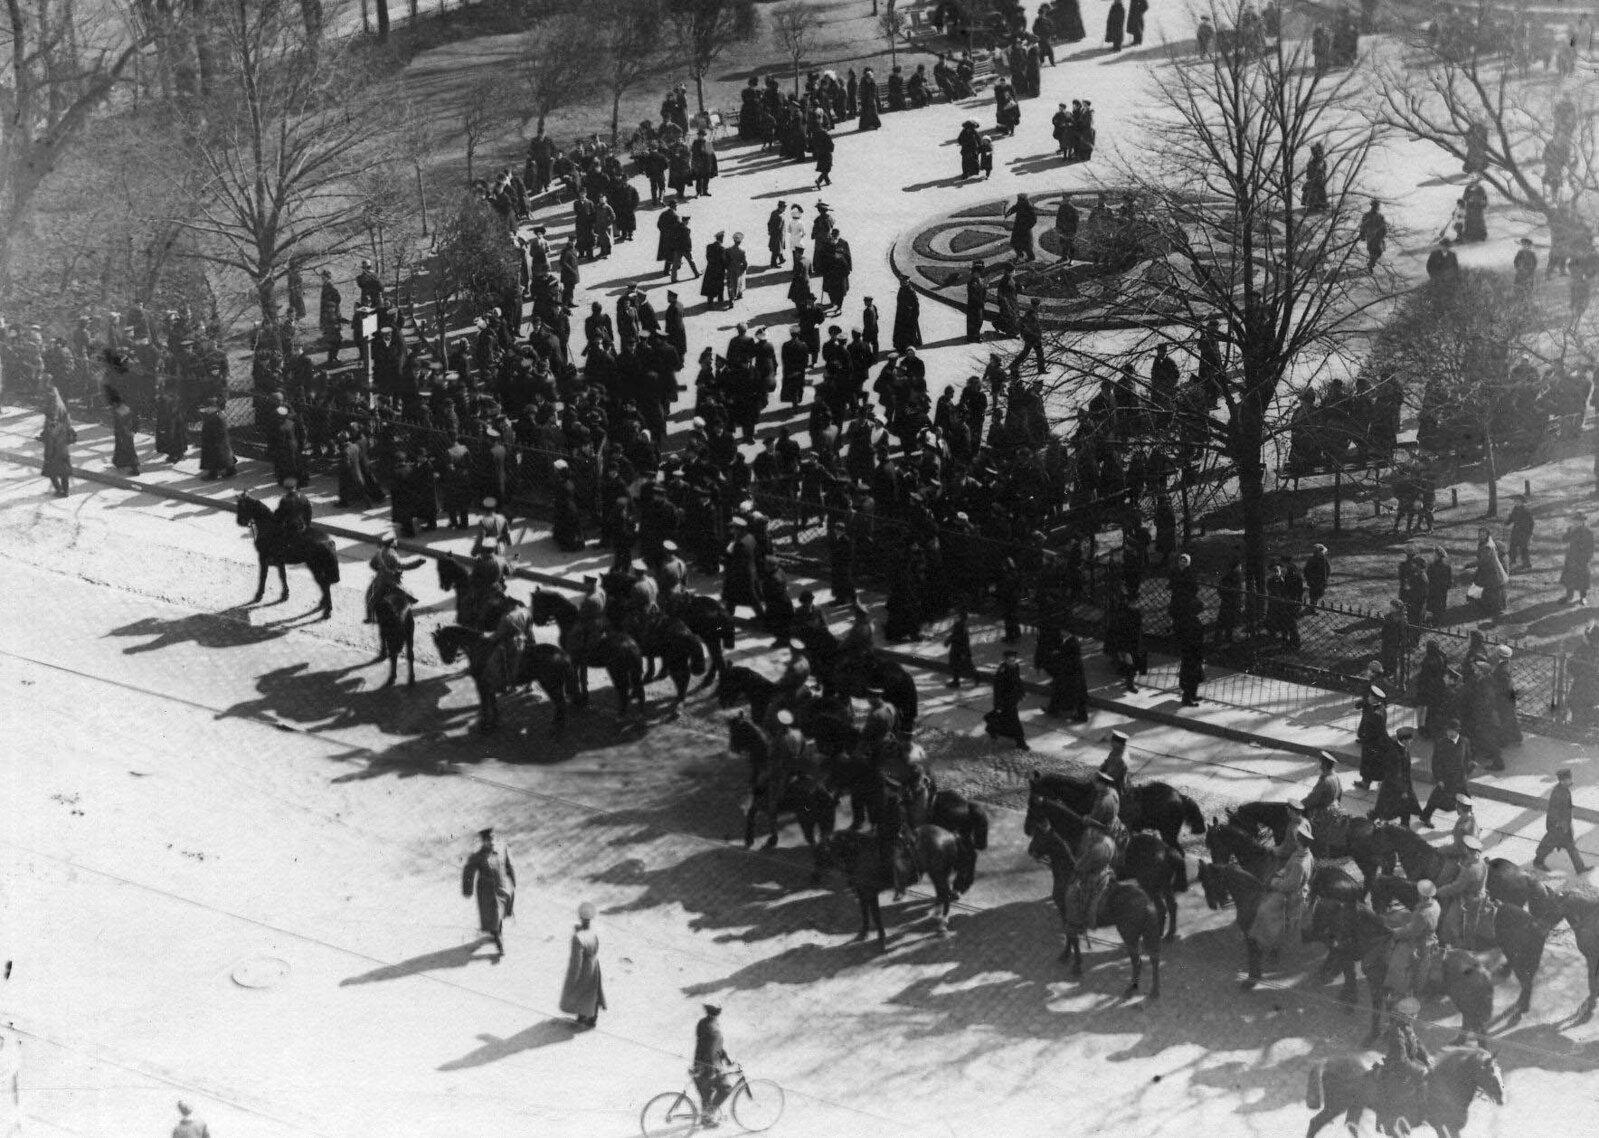 21. 1912. Разгон демонстрации протеста на Невском проспекте. Санкт-Петербург. 15 апреля.